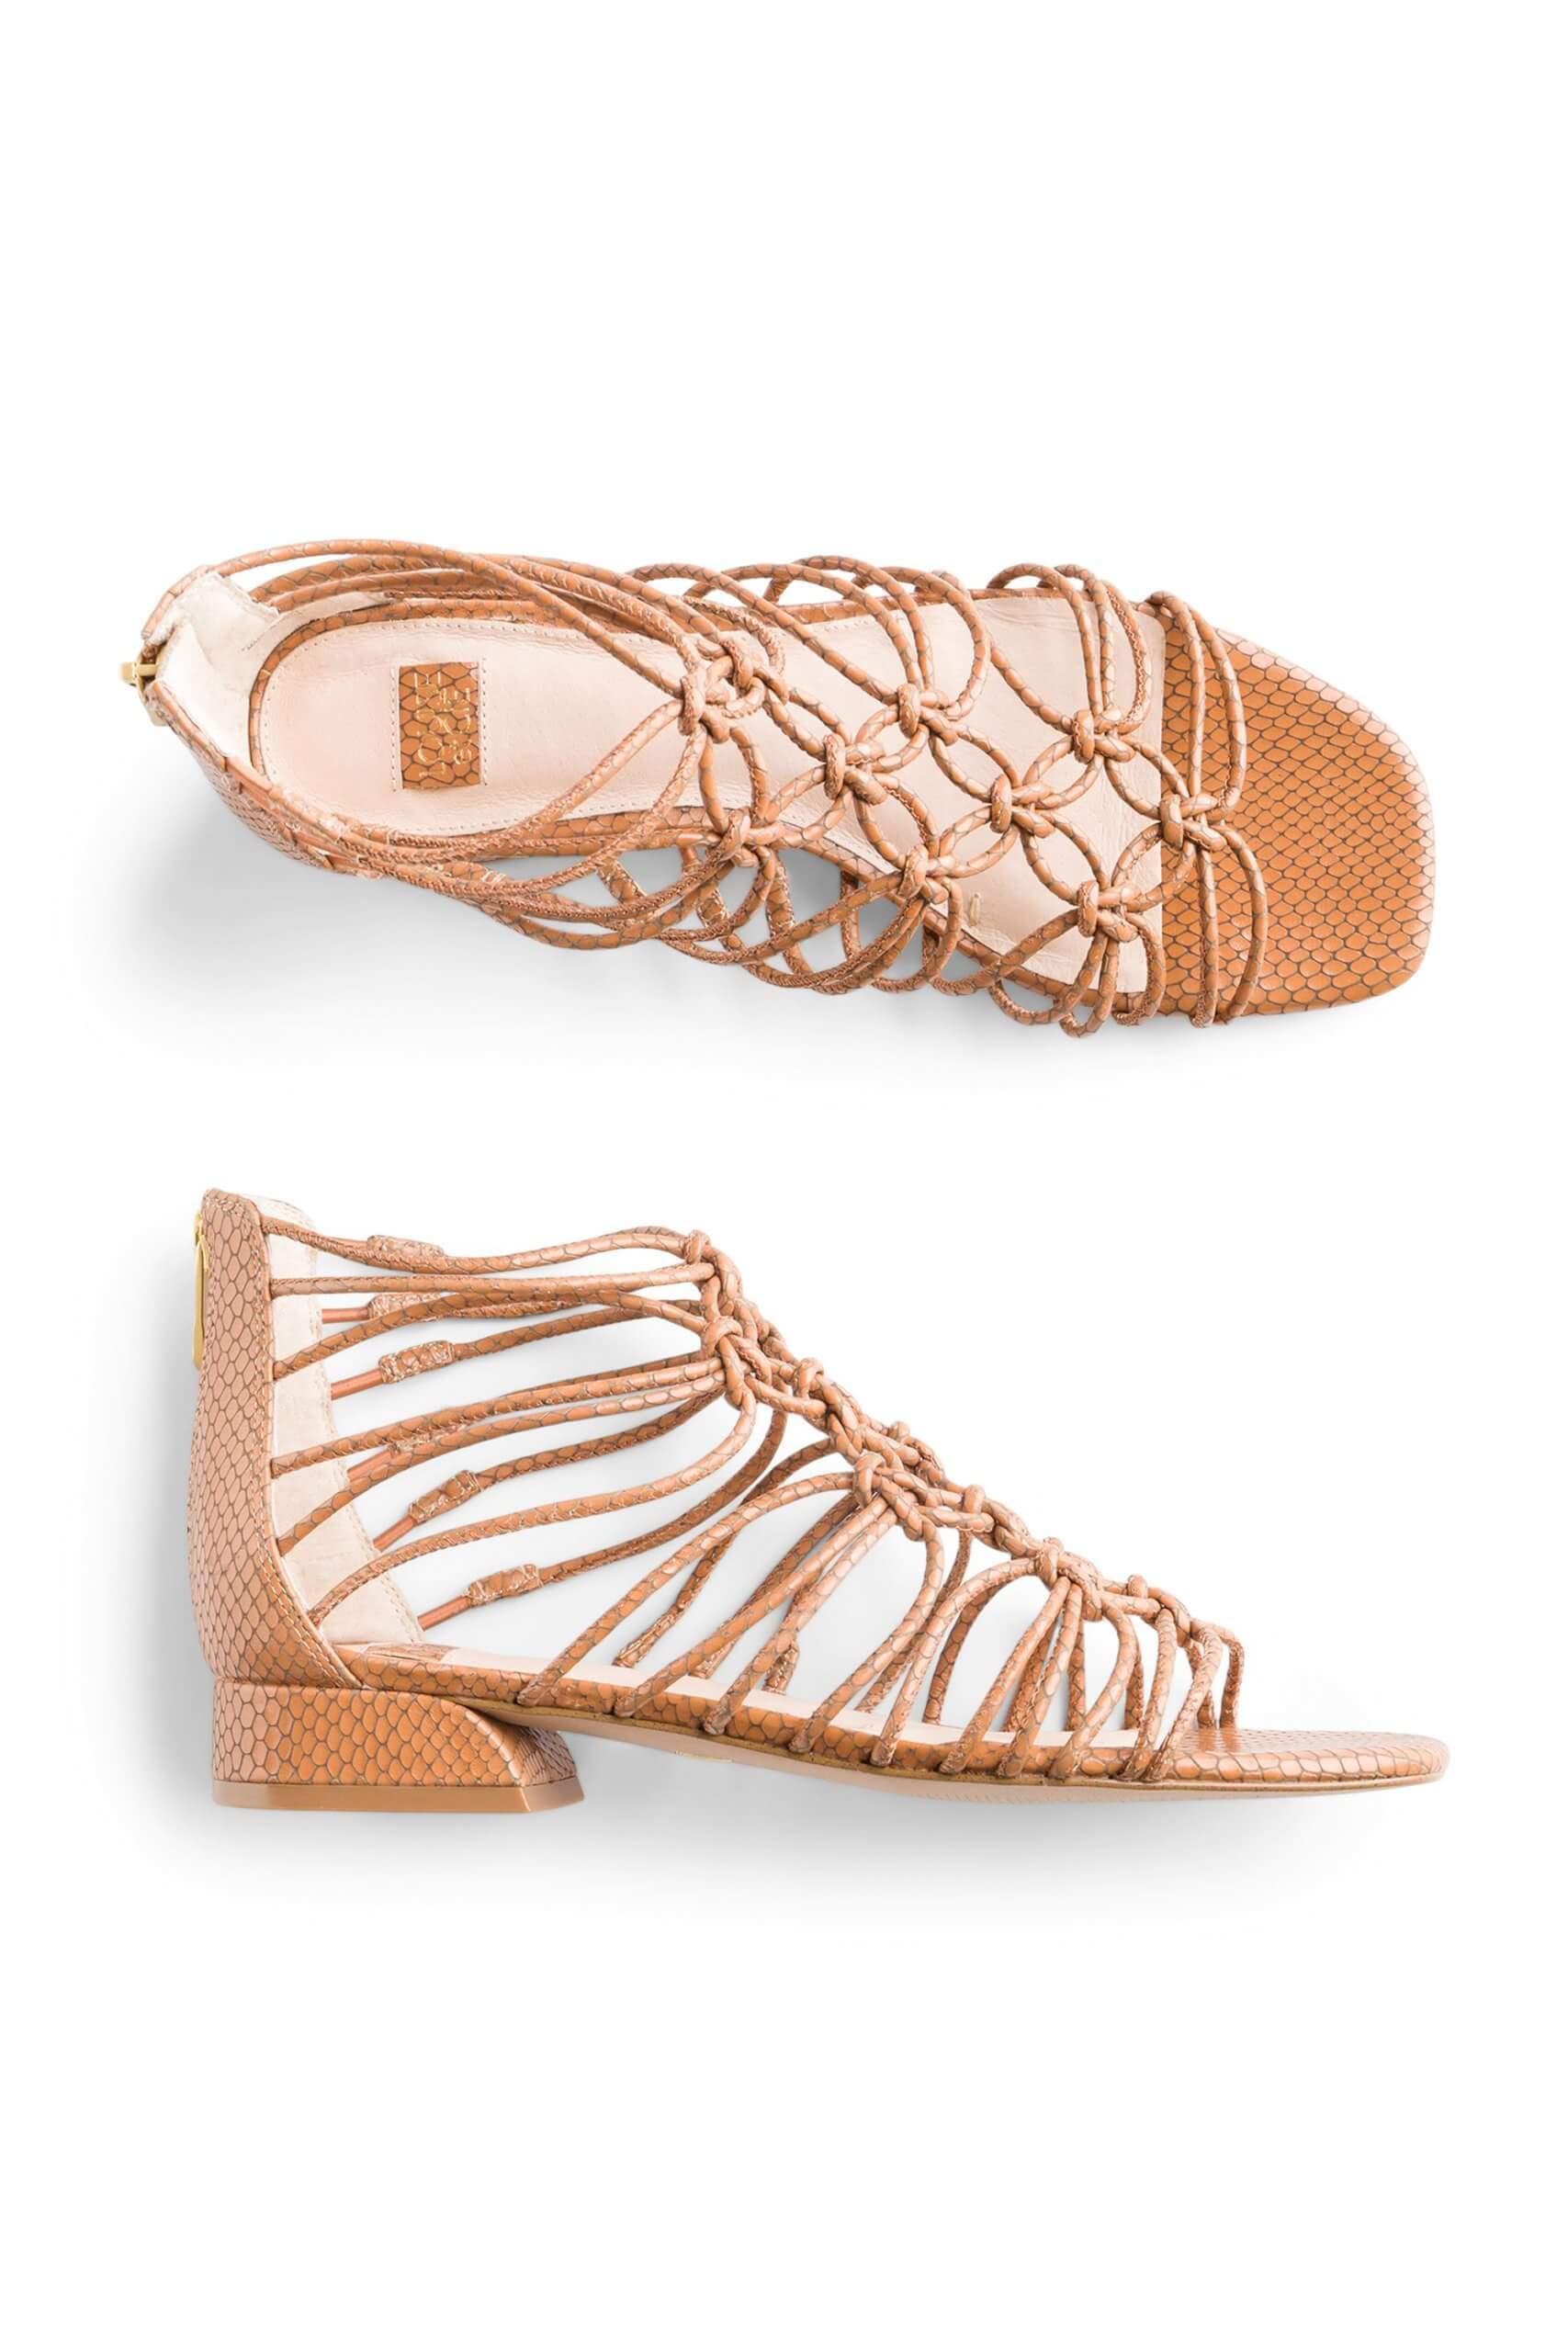 Stitch Fix Women's light brown gladiator sandals.